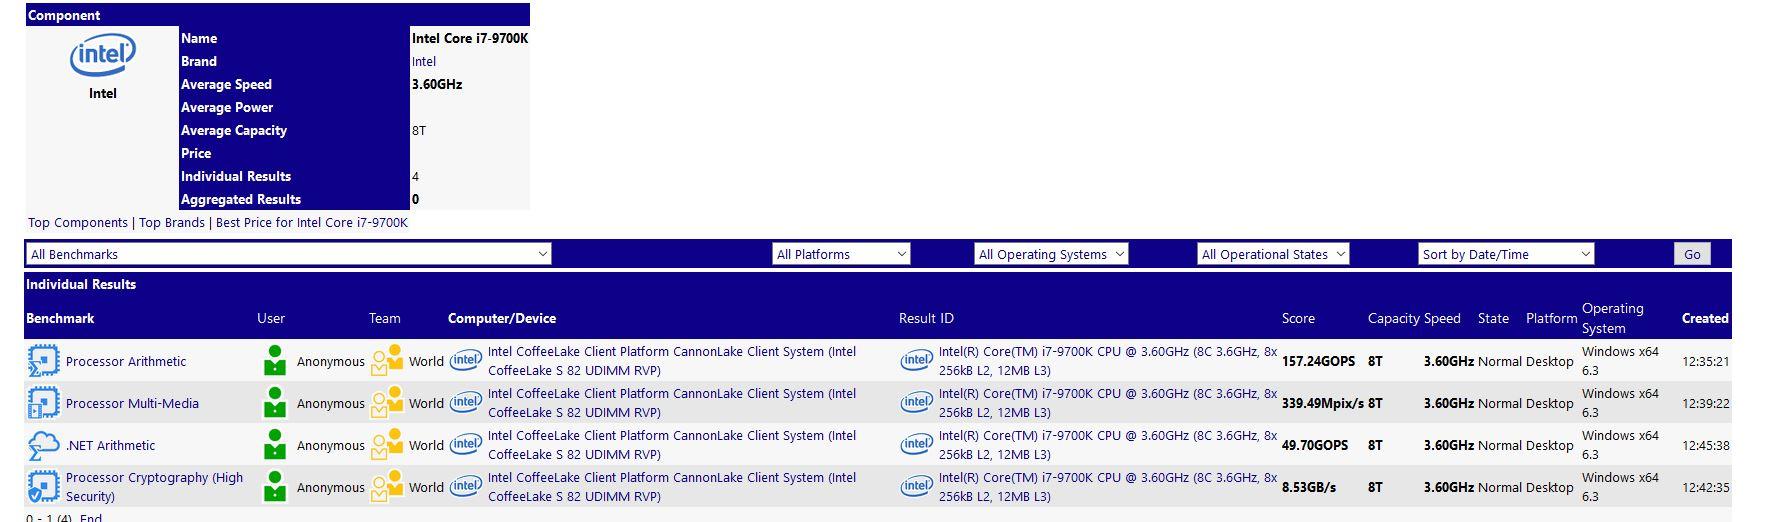 Intel Core i7-9700K Leak